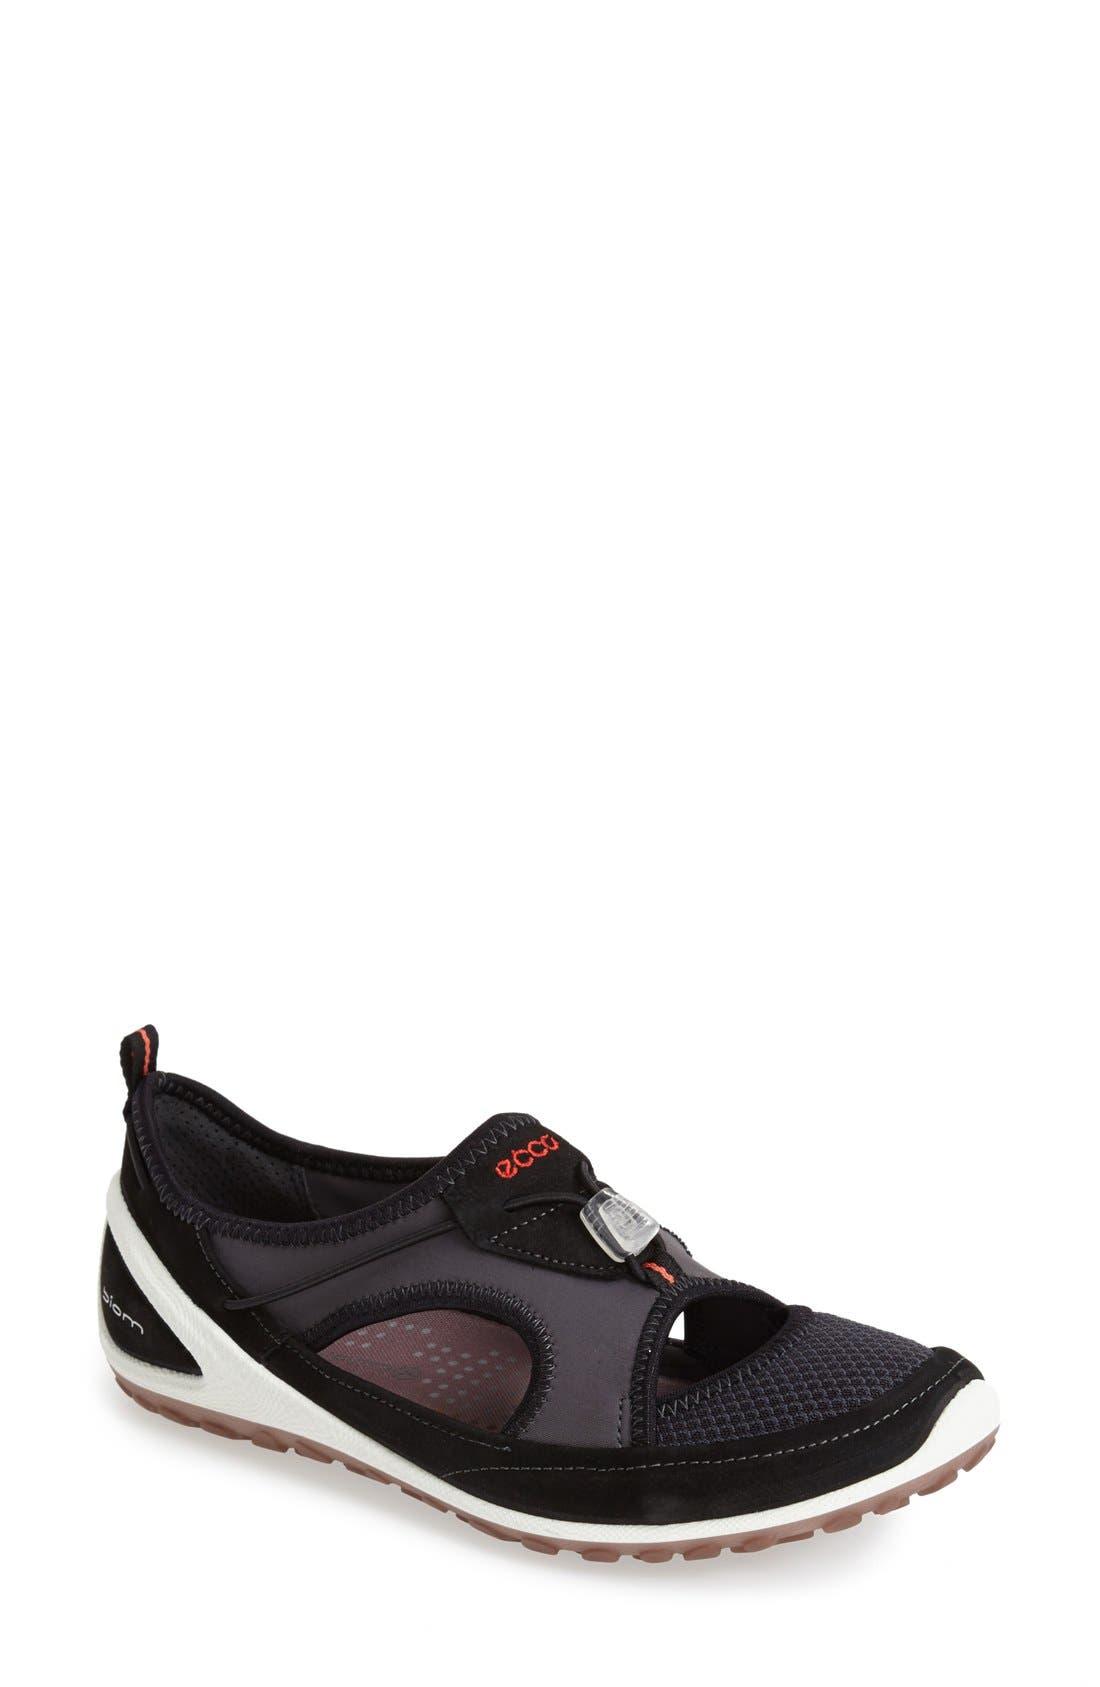 Main Image Dunham Windsor Waterproof Sneaker Men